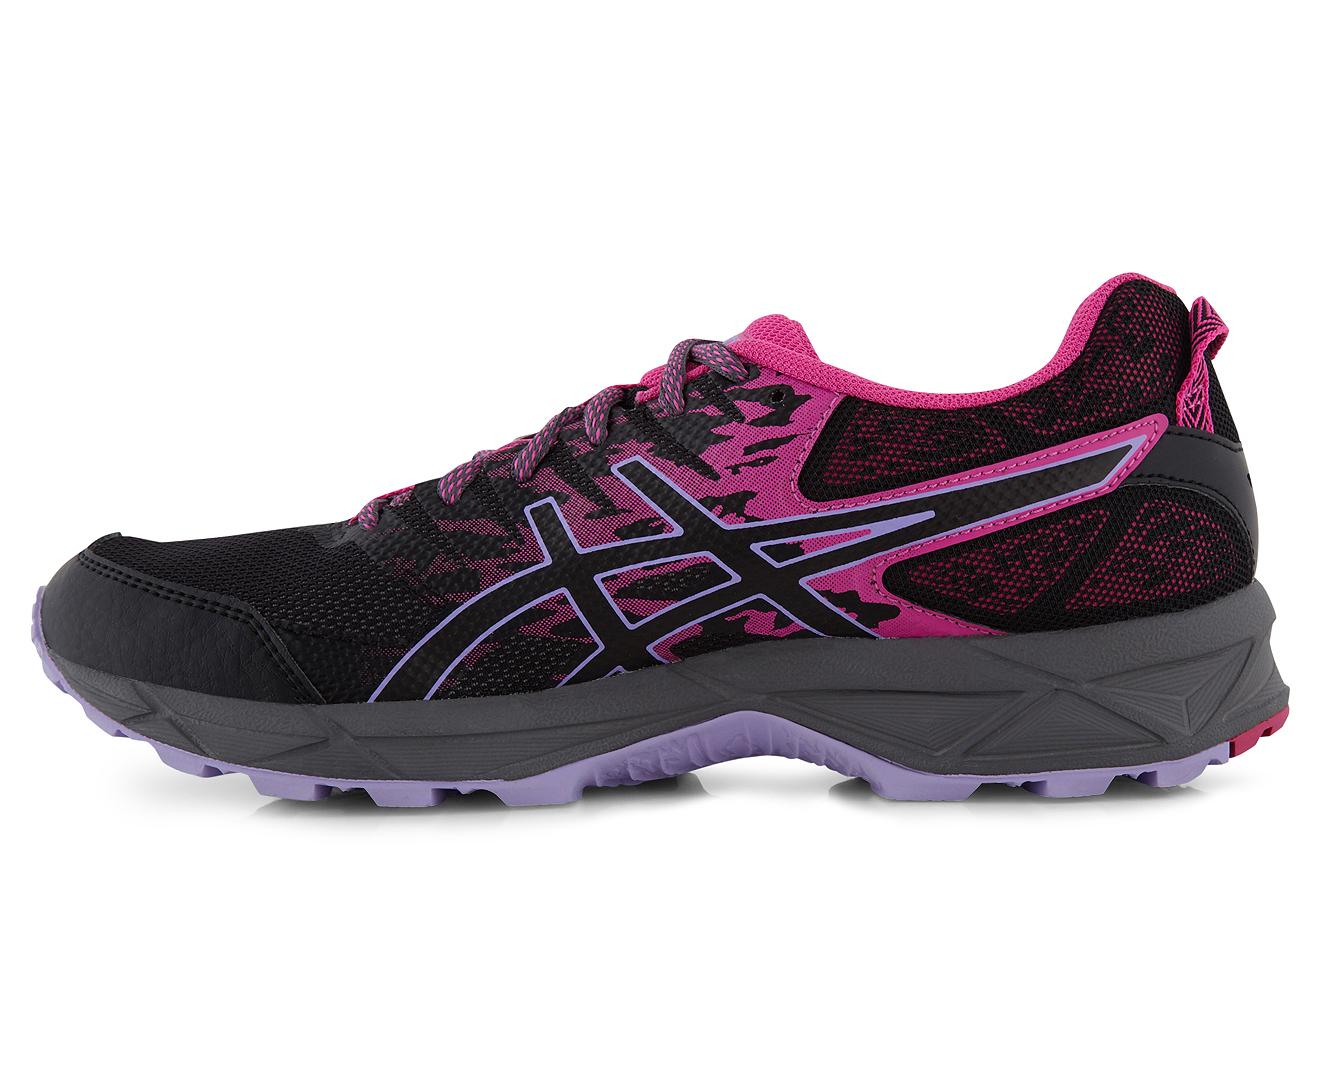 a592d1f2a3d5 ASICS Women s GEL-Sonoma 3 Shoe - Pink Glow Black Lavender